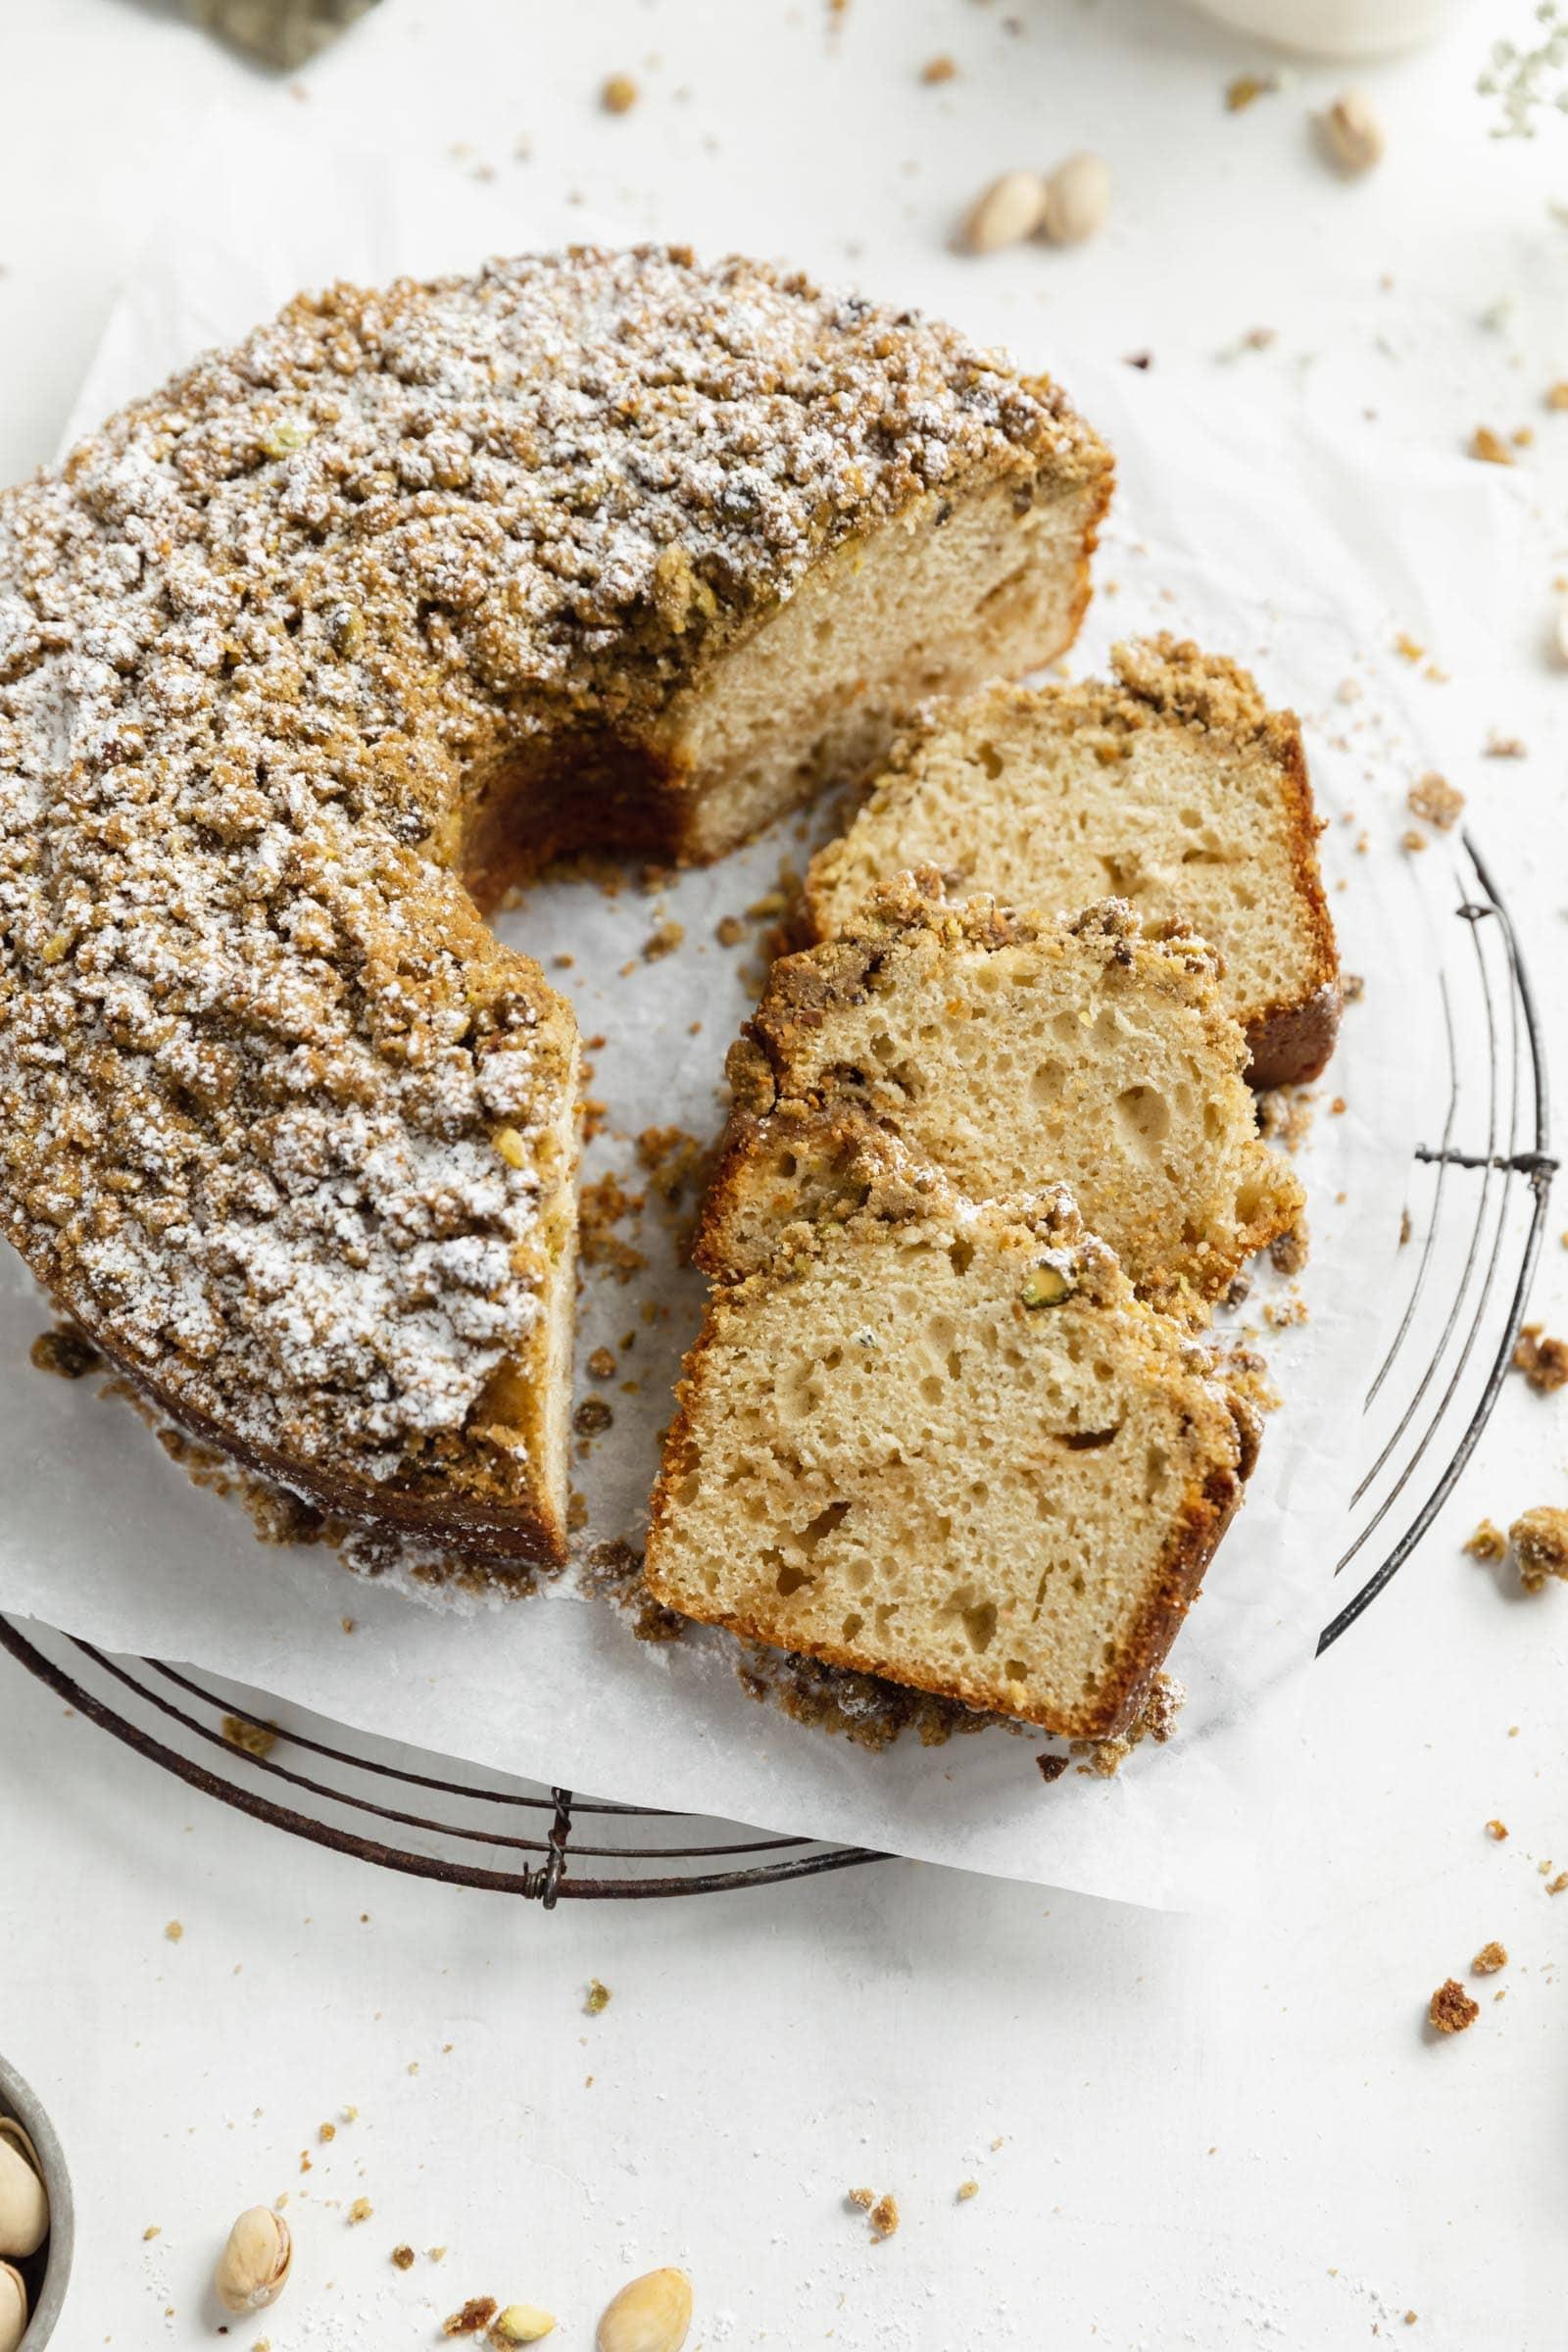 cardamom pistachio coffee cake with pistachio streusel